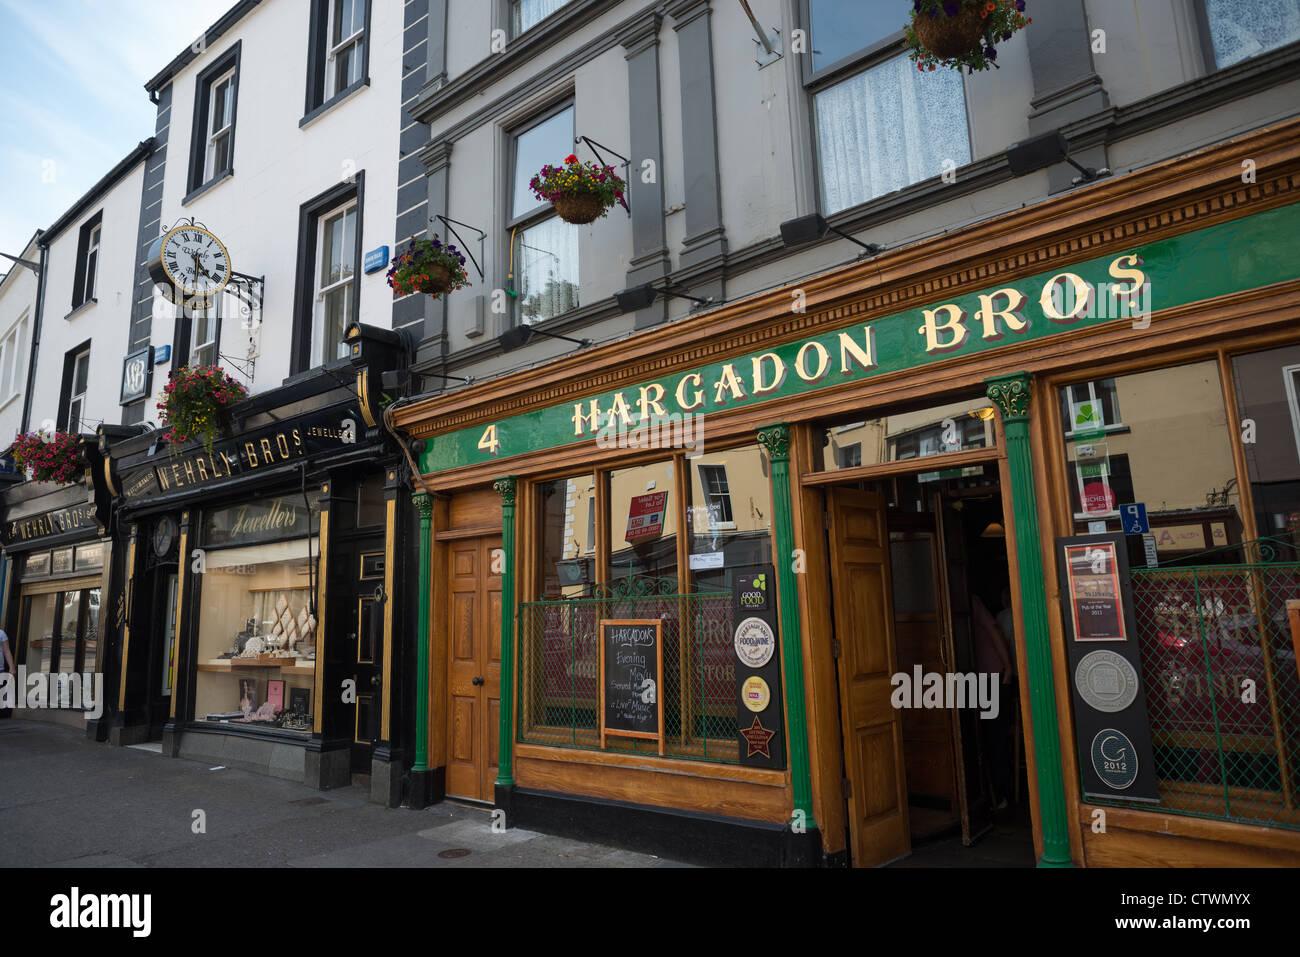 Pub and character shop fronts on O'Connell Street, Sligo town, Sligo county, Republic Ireland. - Stock Image